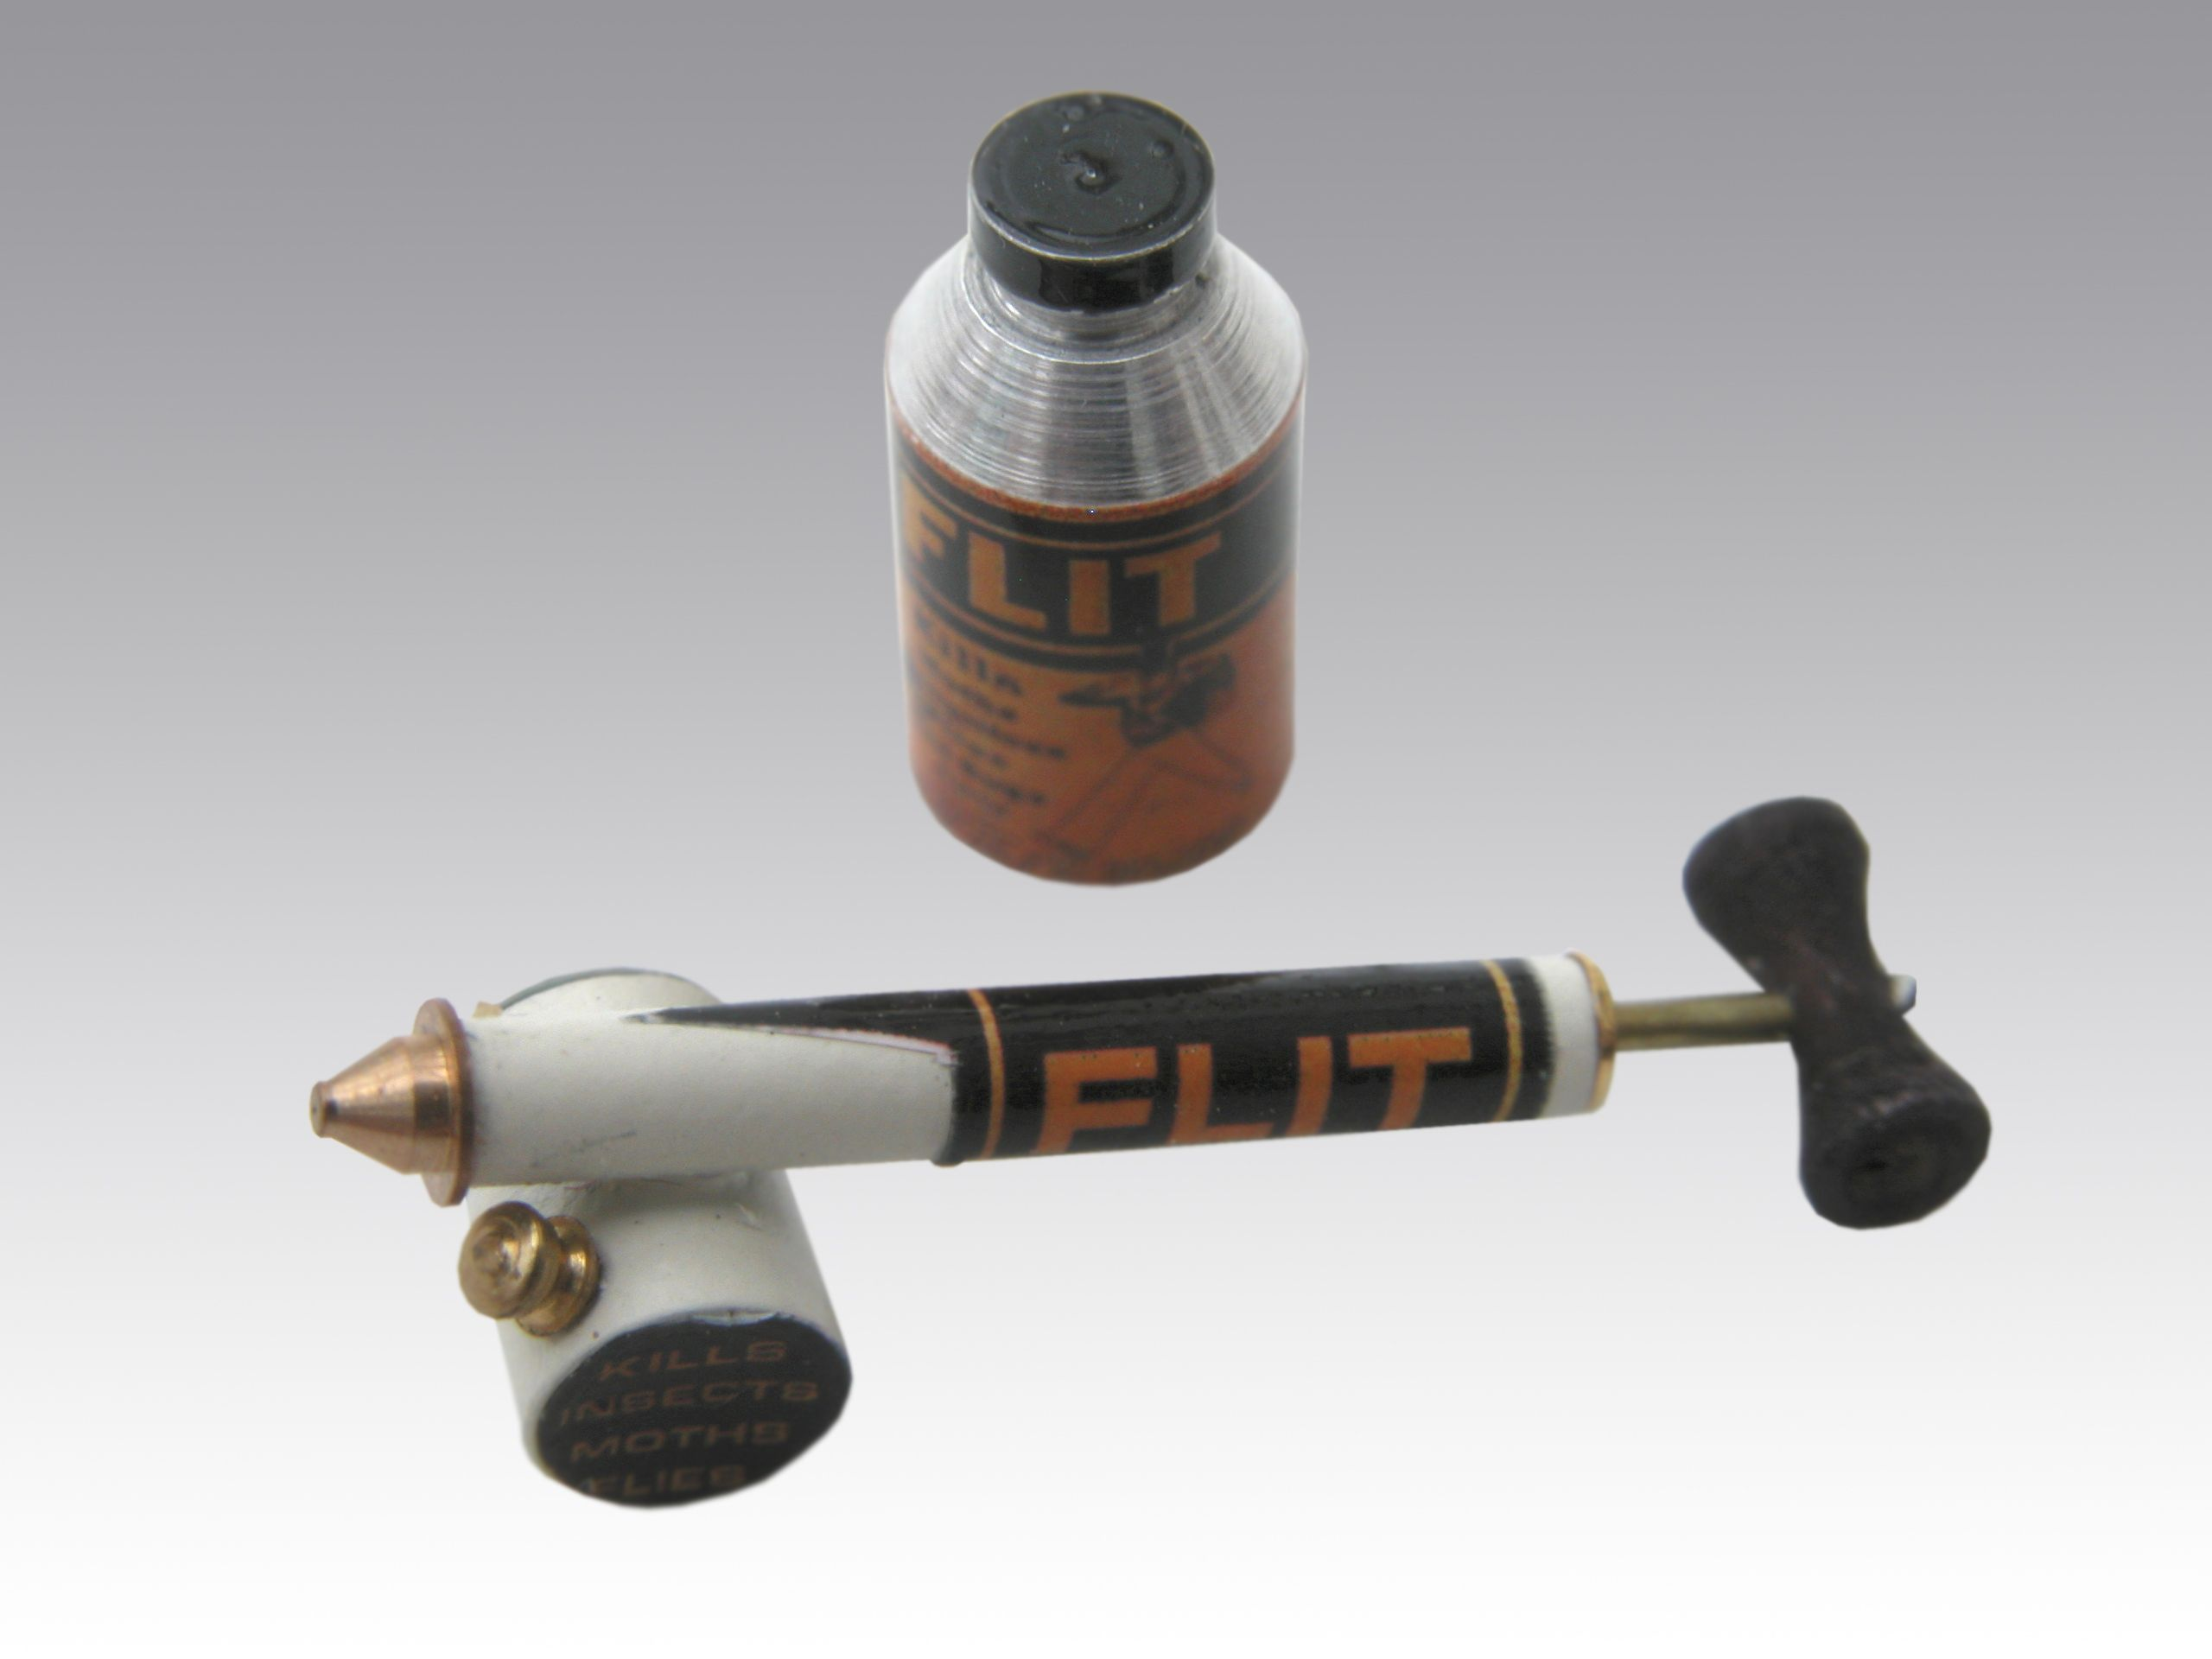 flit spray and spray pump by truly scrumptious www